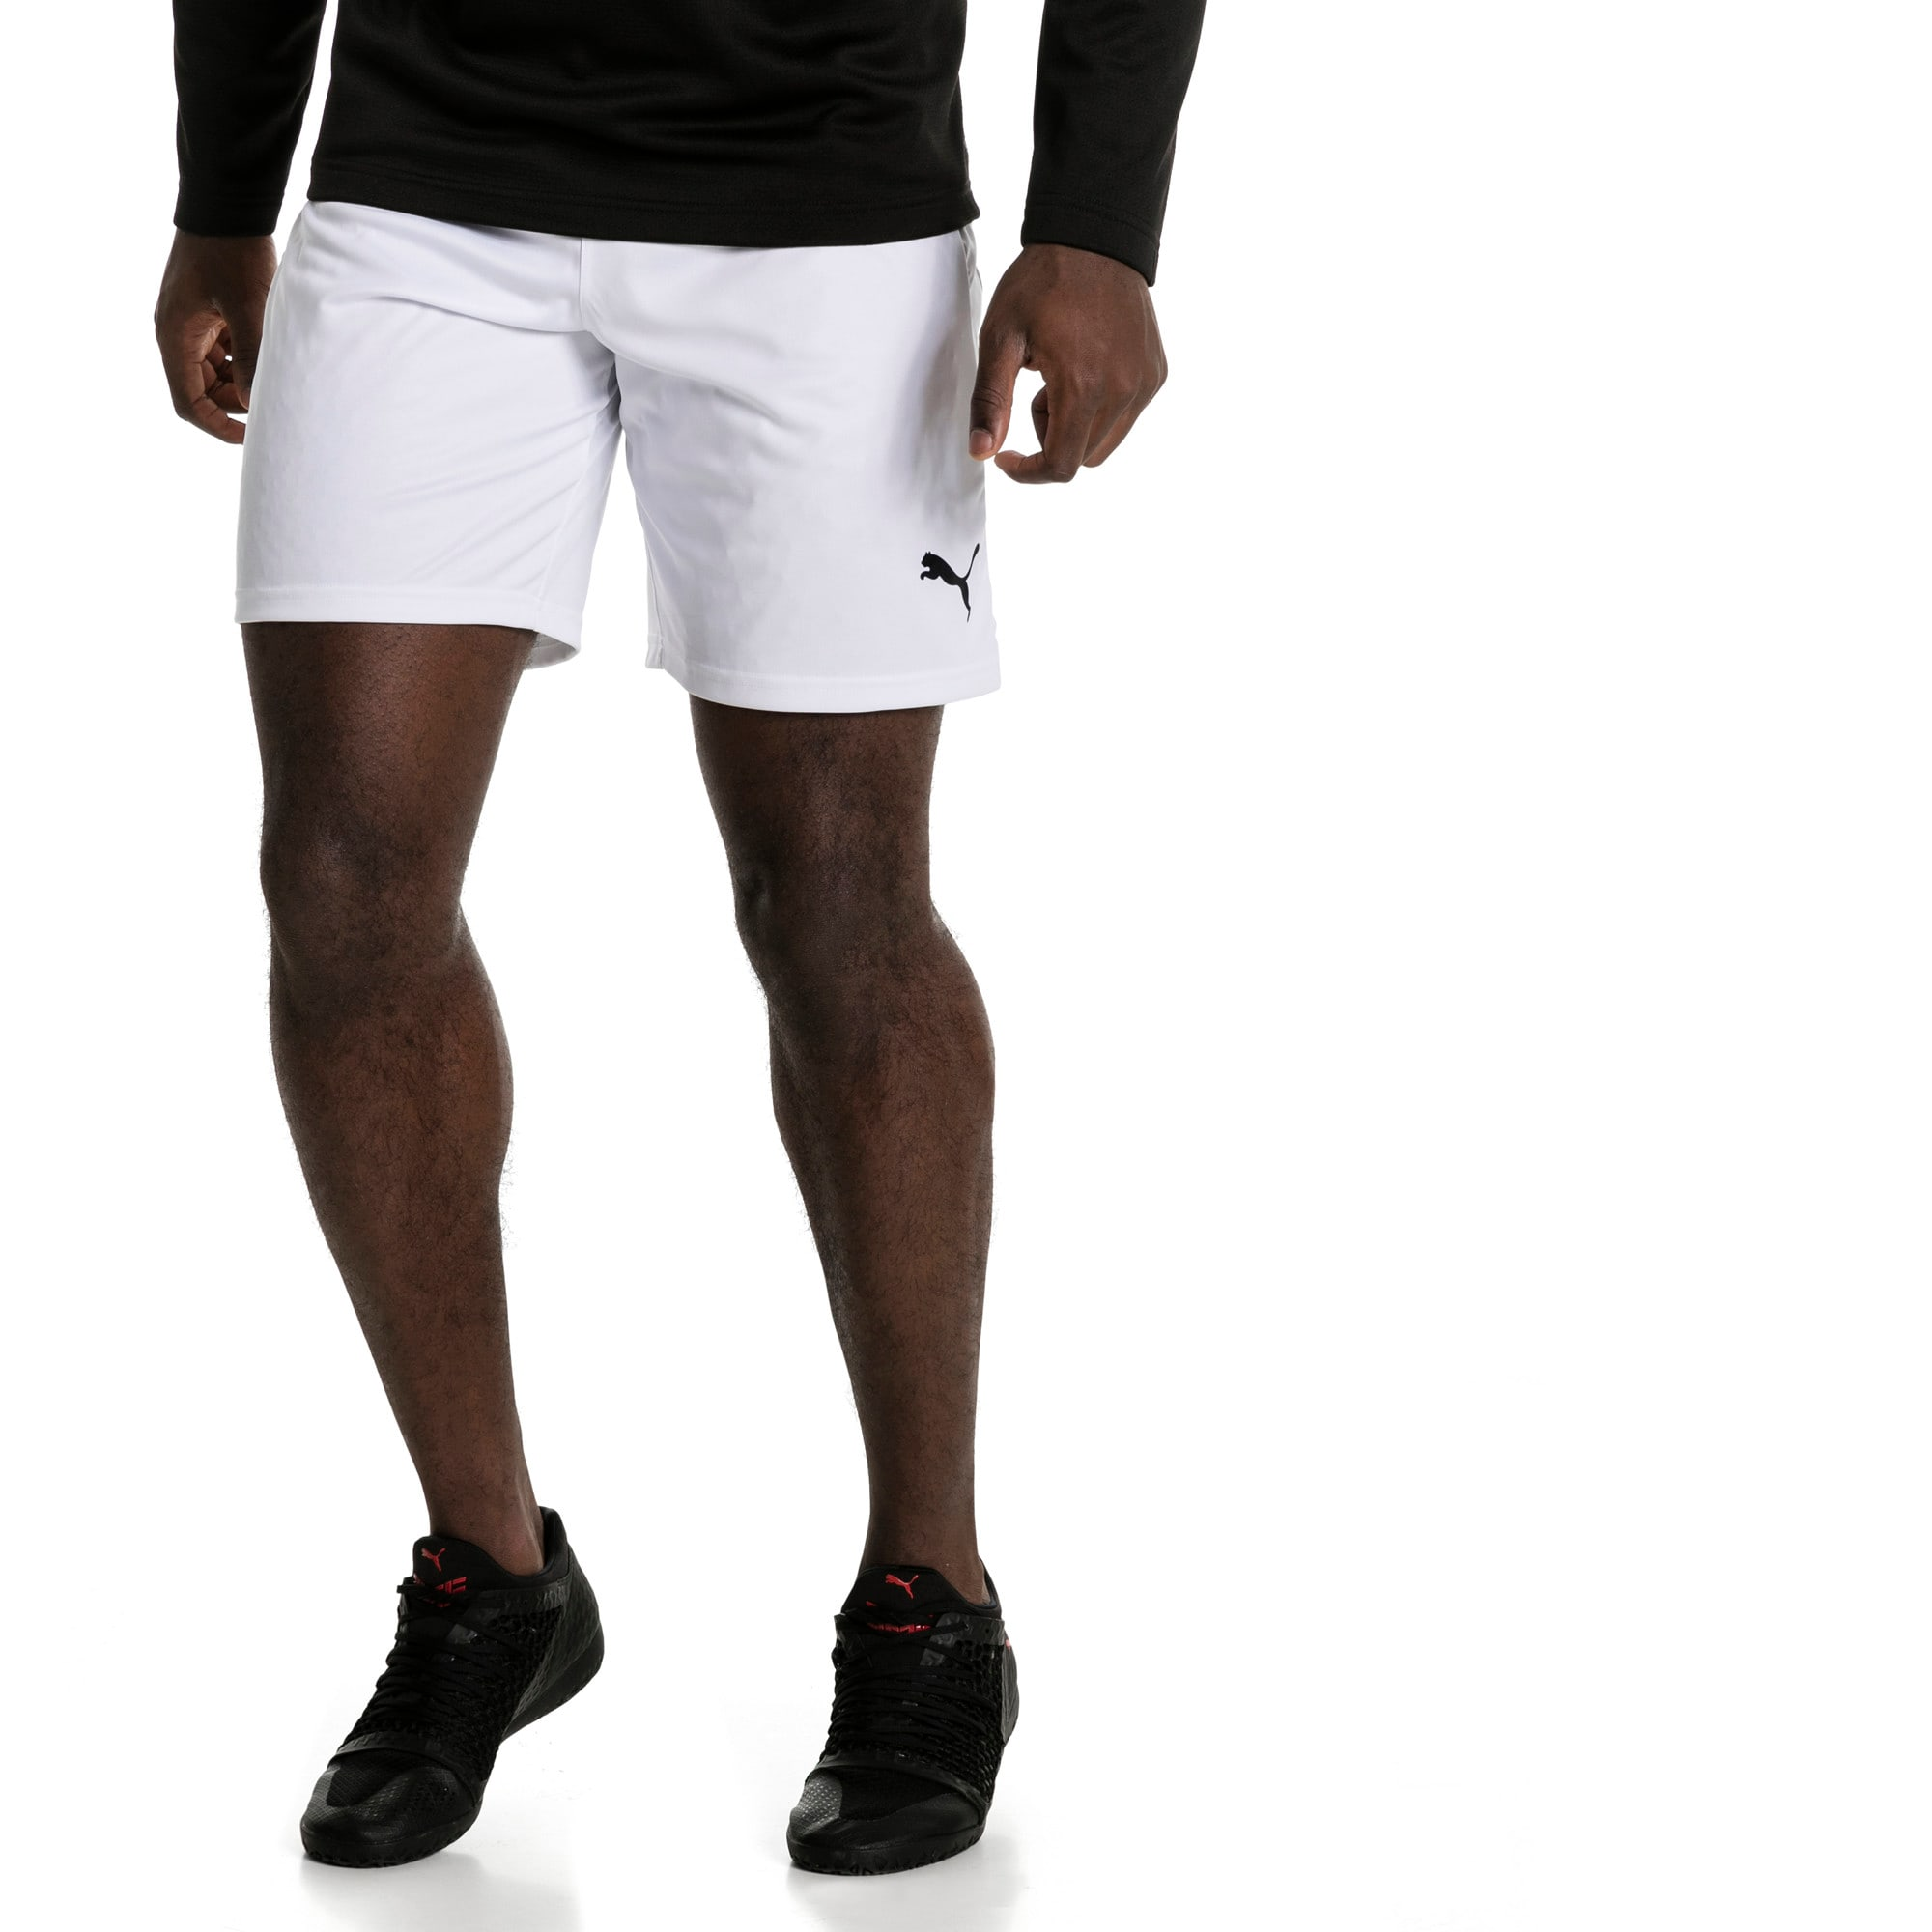 Thumbnail 2 of Liga Men's Shorts, Puma White-Puma Black, medium